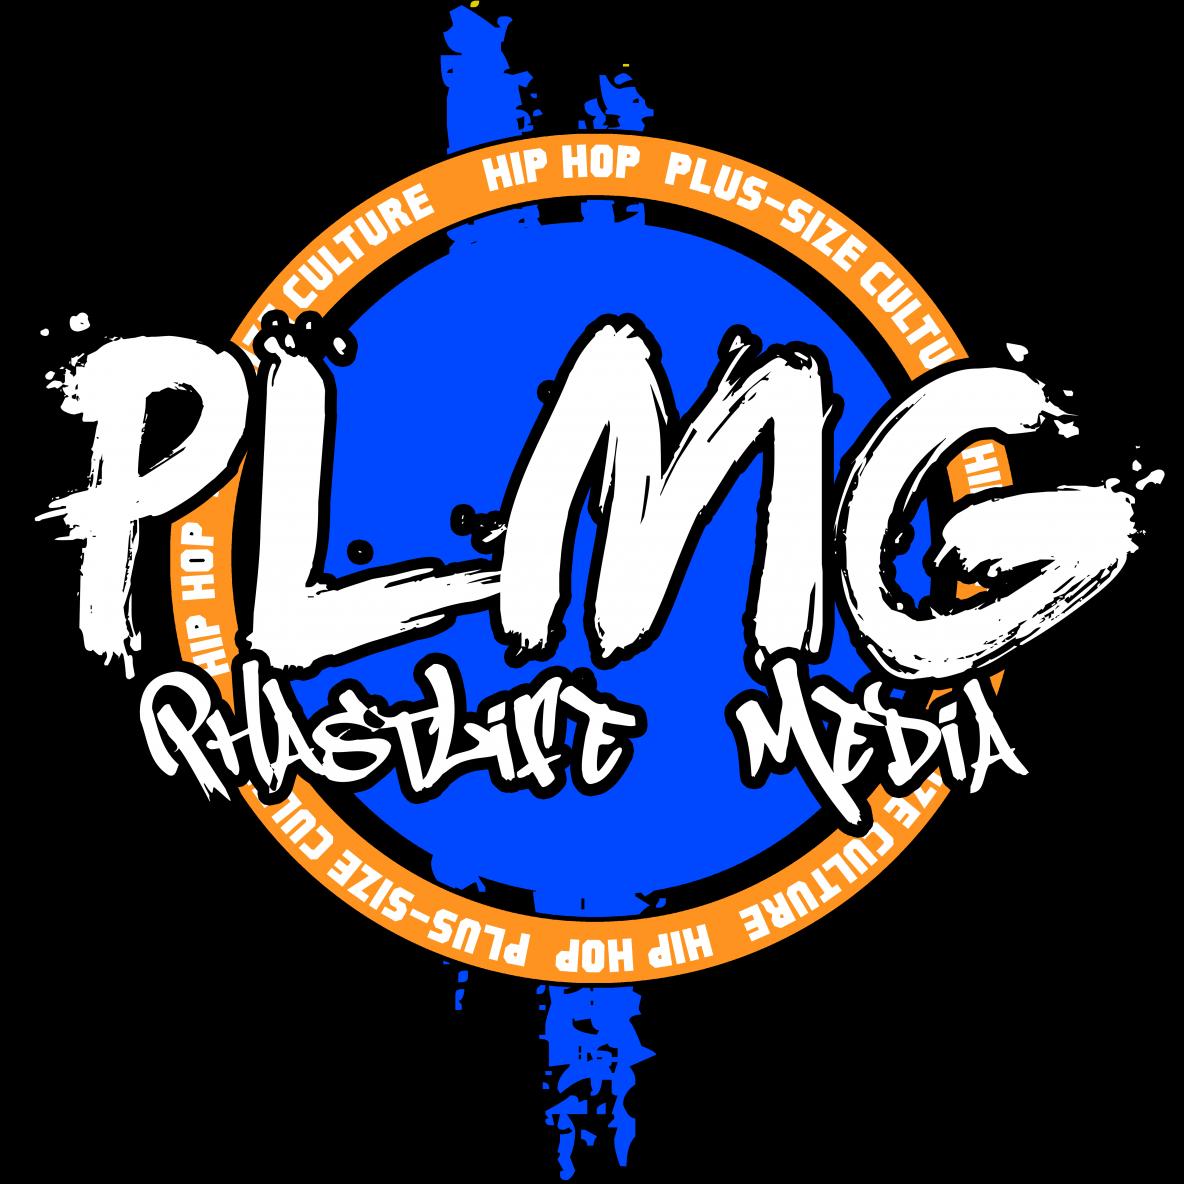 Phastlife Media - Positive_K_Think_About_You